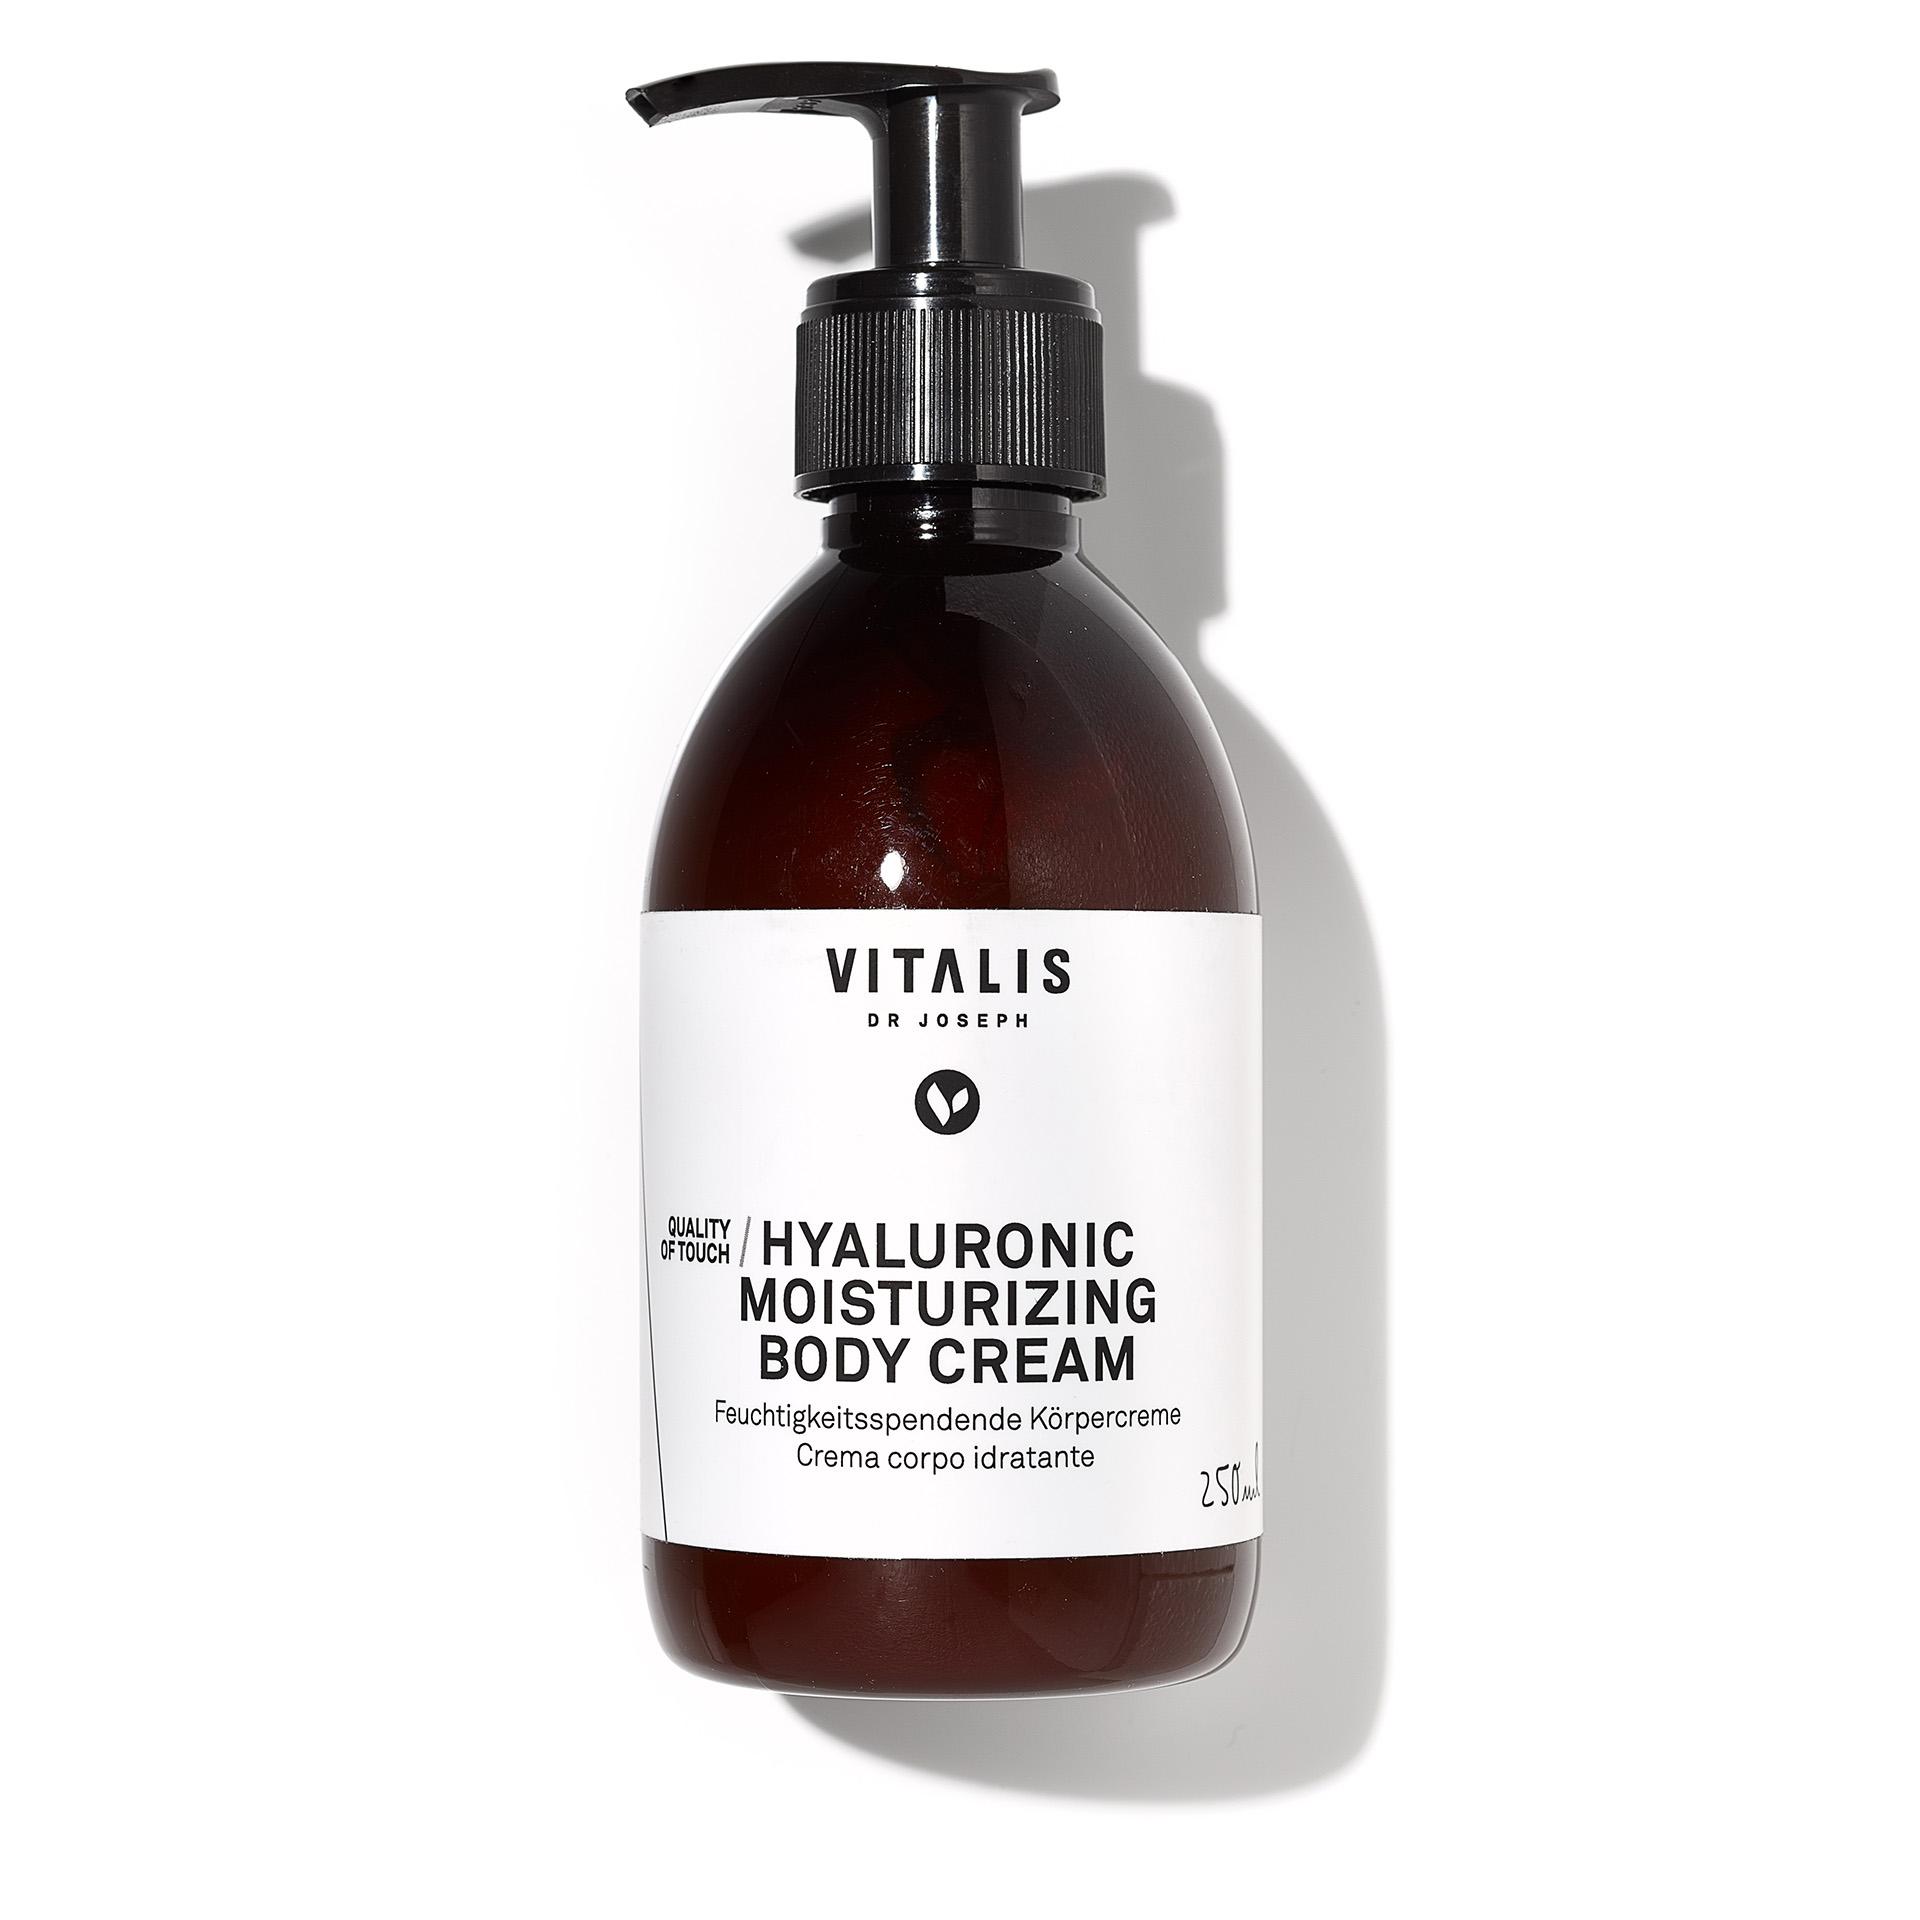 VITALIS Hyaluronic Moisturizing Body Cream VIVAMAYR